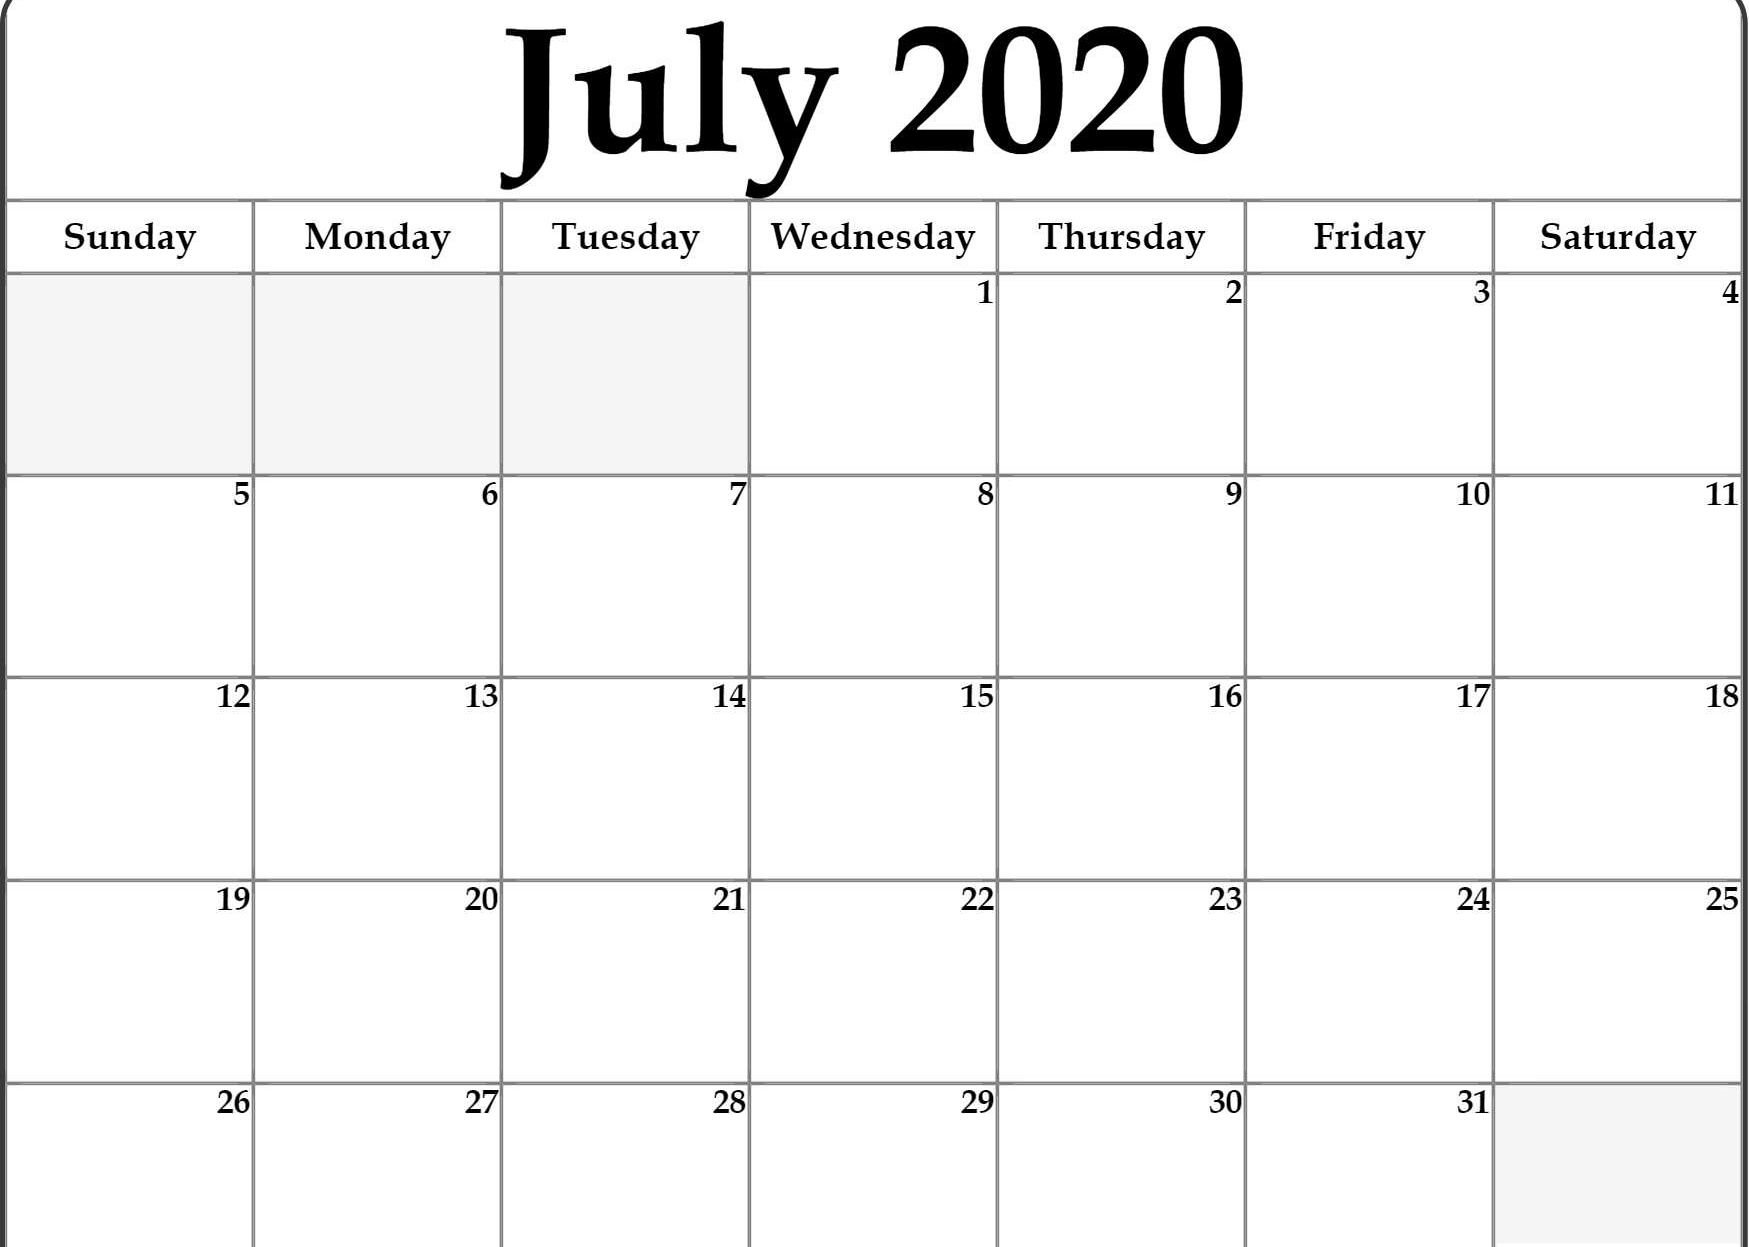 Printable Calendar For July 2020 | July Calendar, Printable within Printable Fill In Calendar By Month